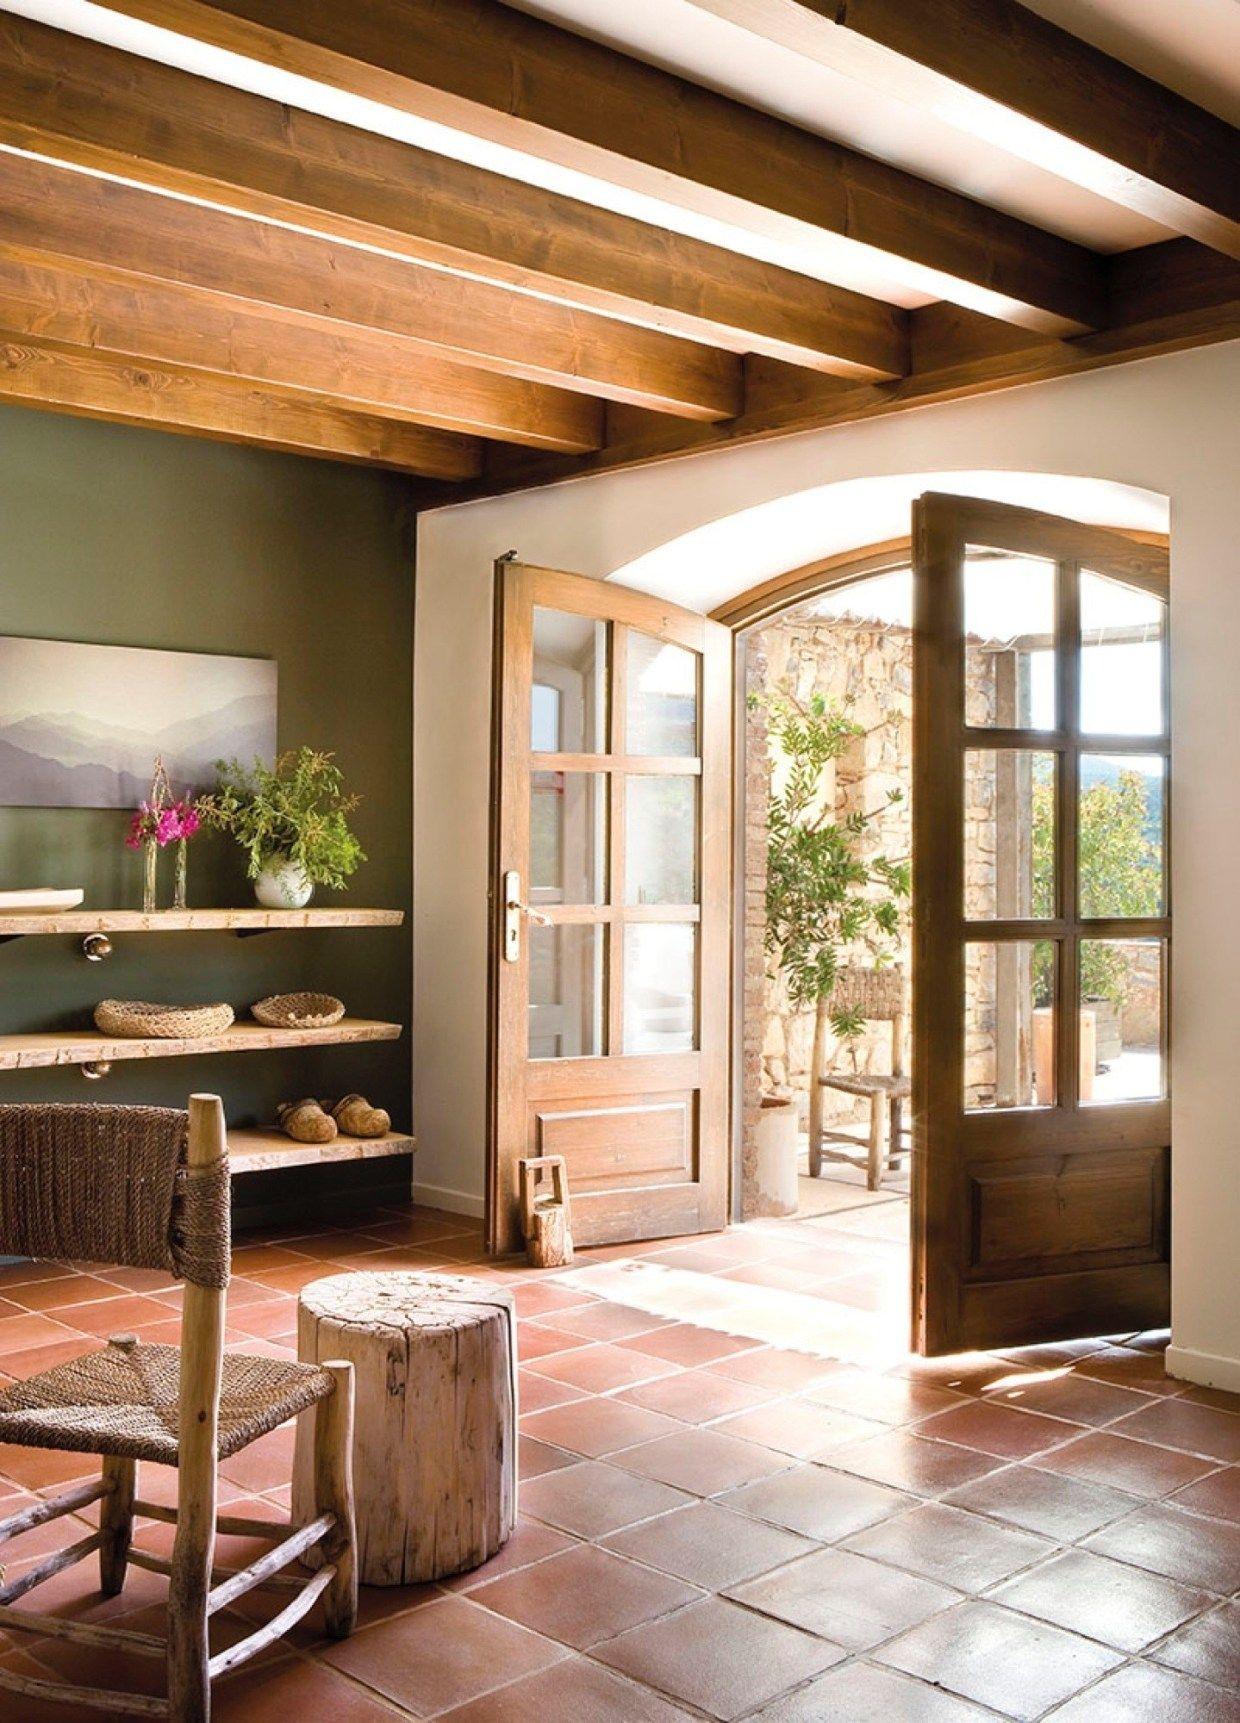 terra cotta floors centsational style house design home interior design trends 2017 on kitchen interior tiles id=34890